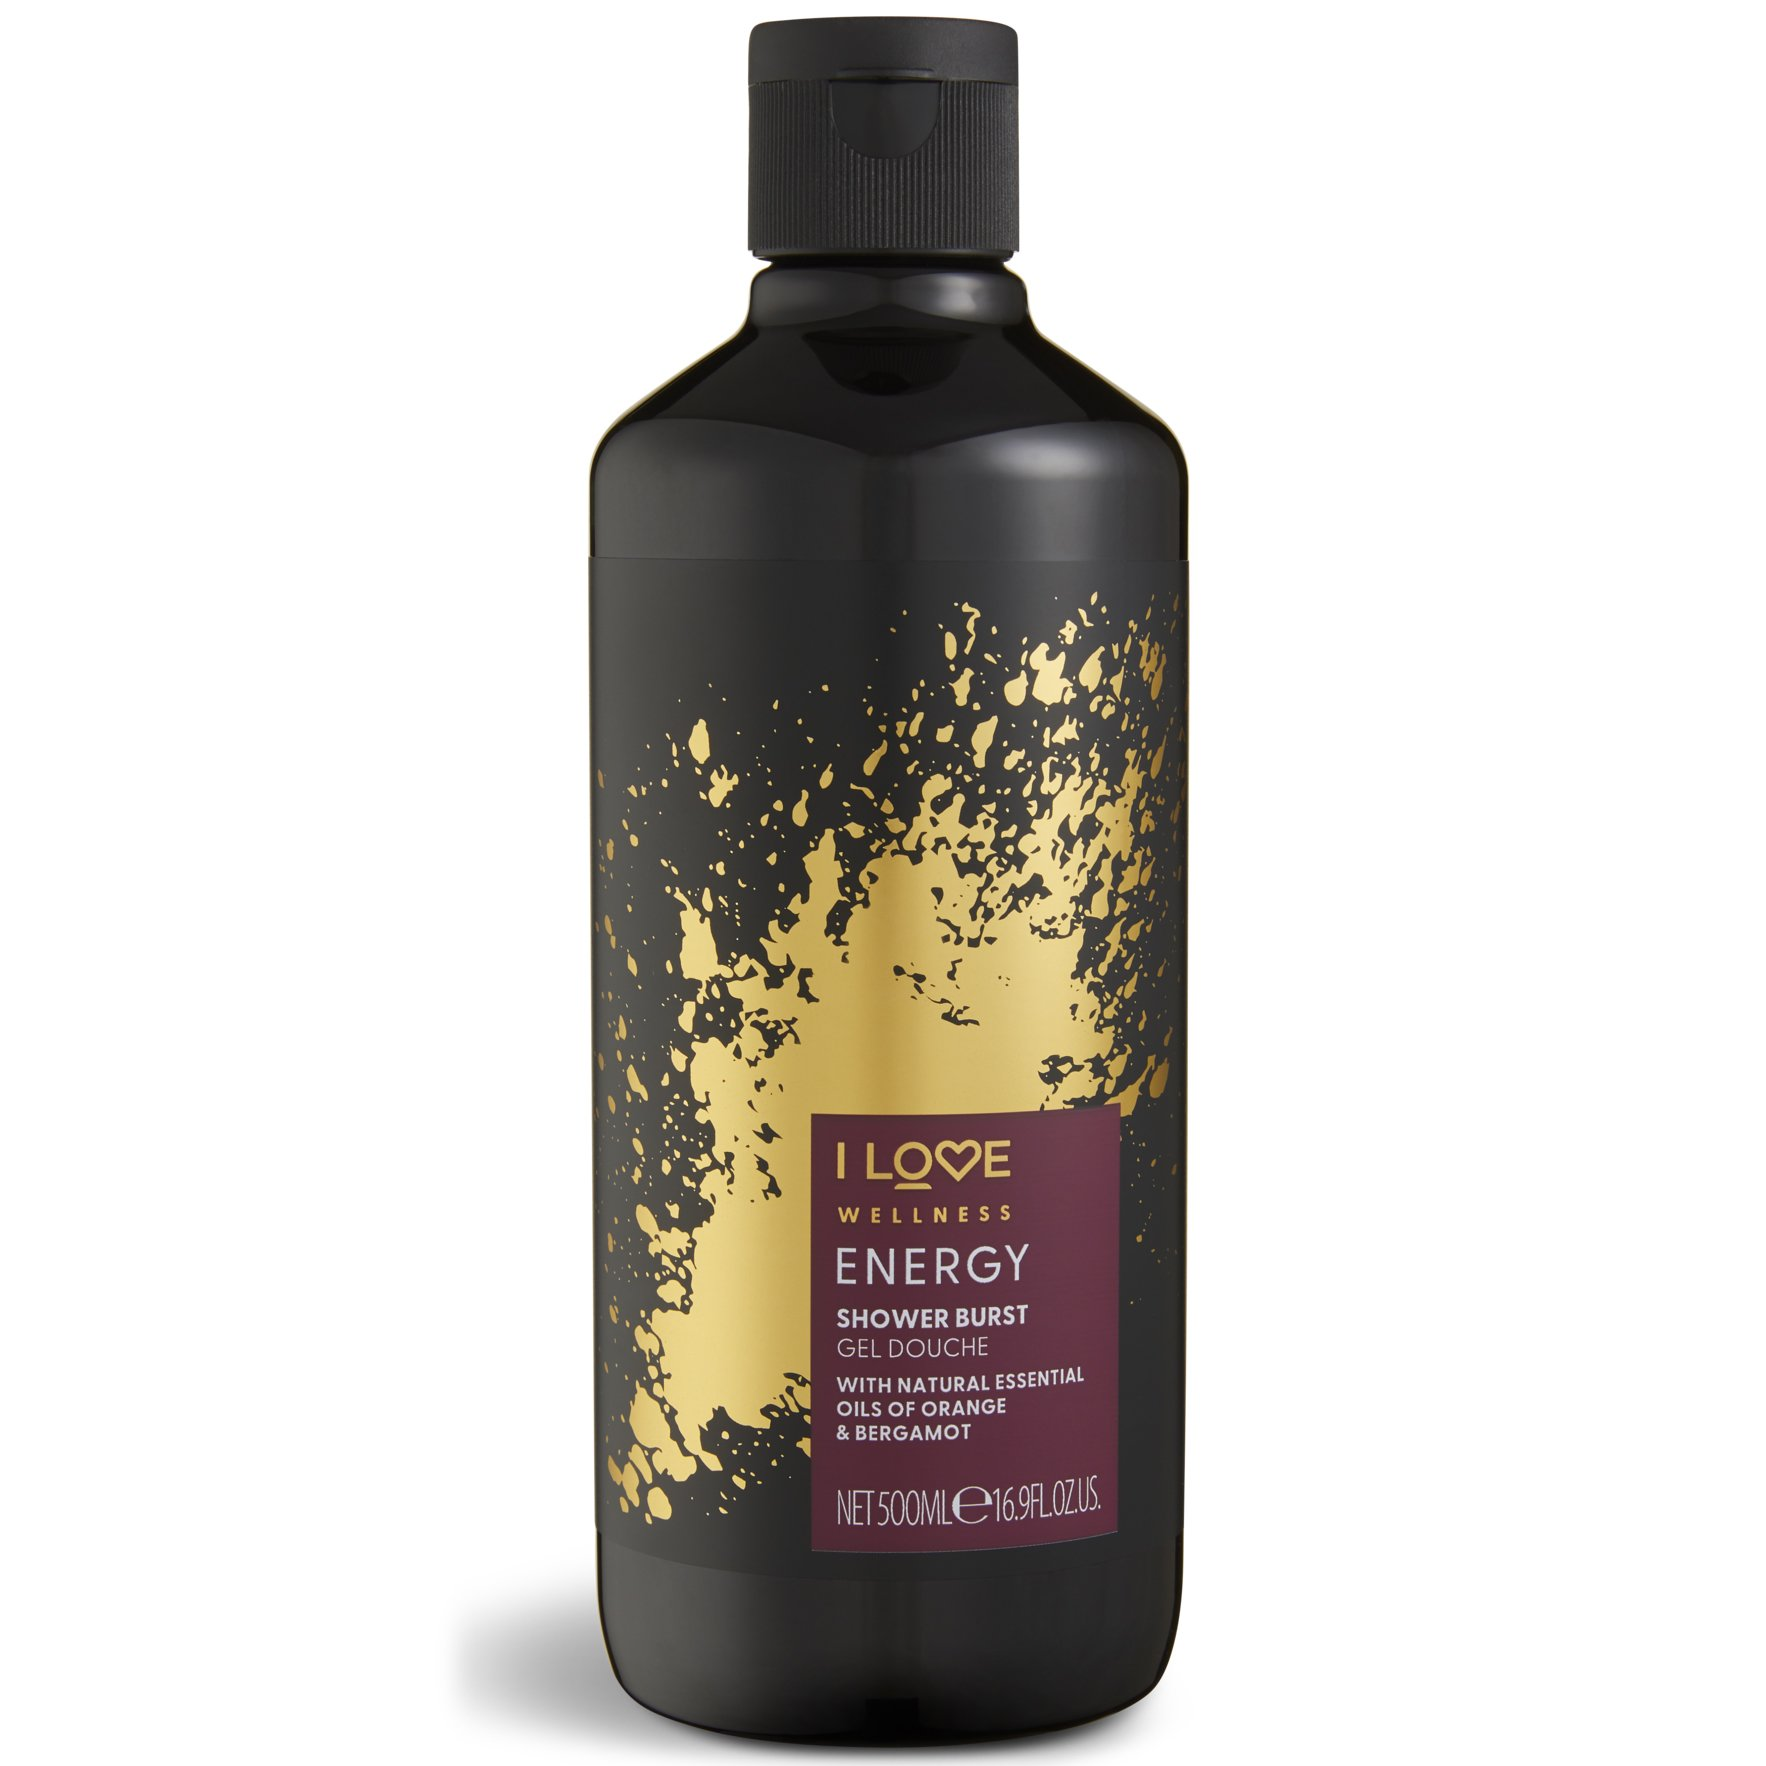 I love… Wellness Energy Shower Burst Gel Douche Αναζωογονητικό Αφρόλουτρο με Φυσικά Αιθέρια Έλαια 500ml